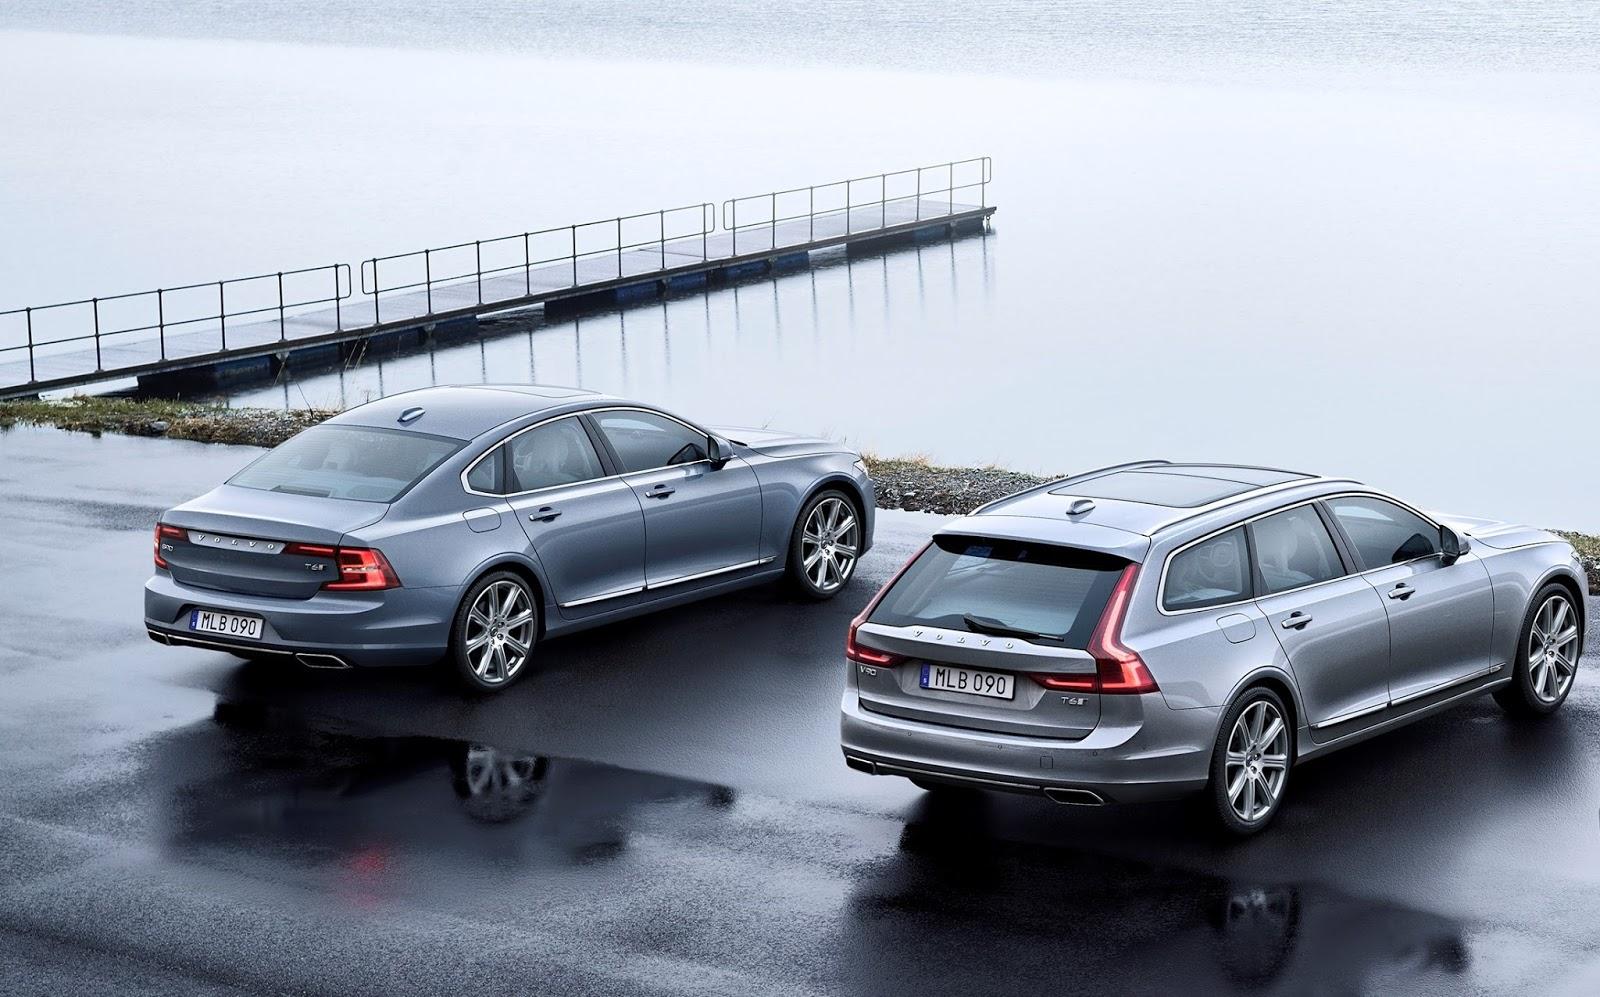 VOLVO2BS902BKAI2BV90 Τα τρία ασφαλέστερα αυτοκίνητα κατά τον Euro NCAP είναι Volvo Euro NCAP, Safety, Volvo, ασφάλεια